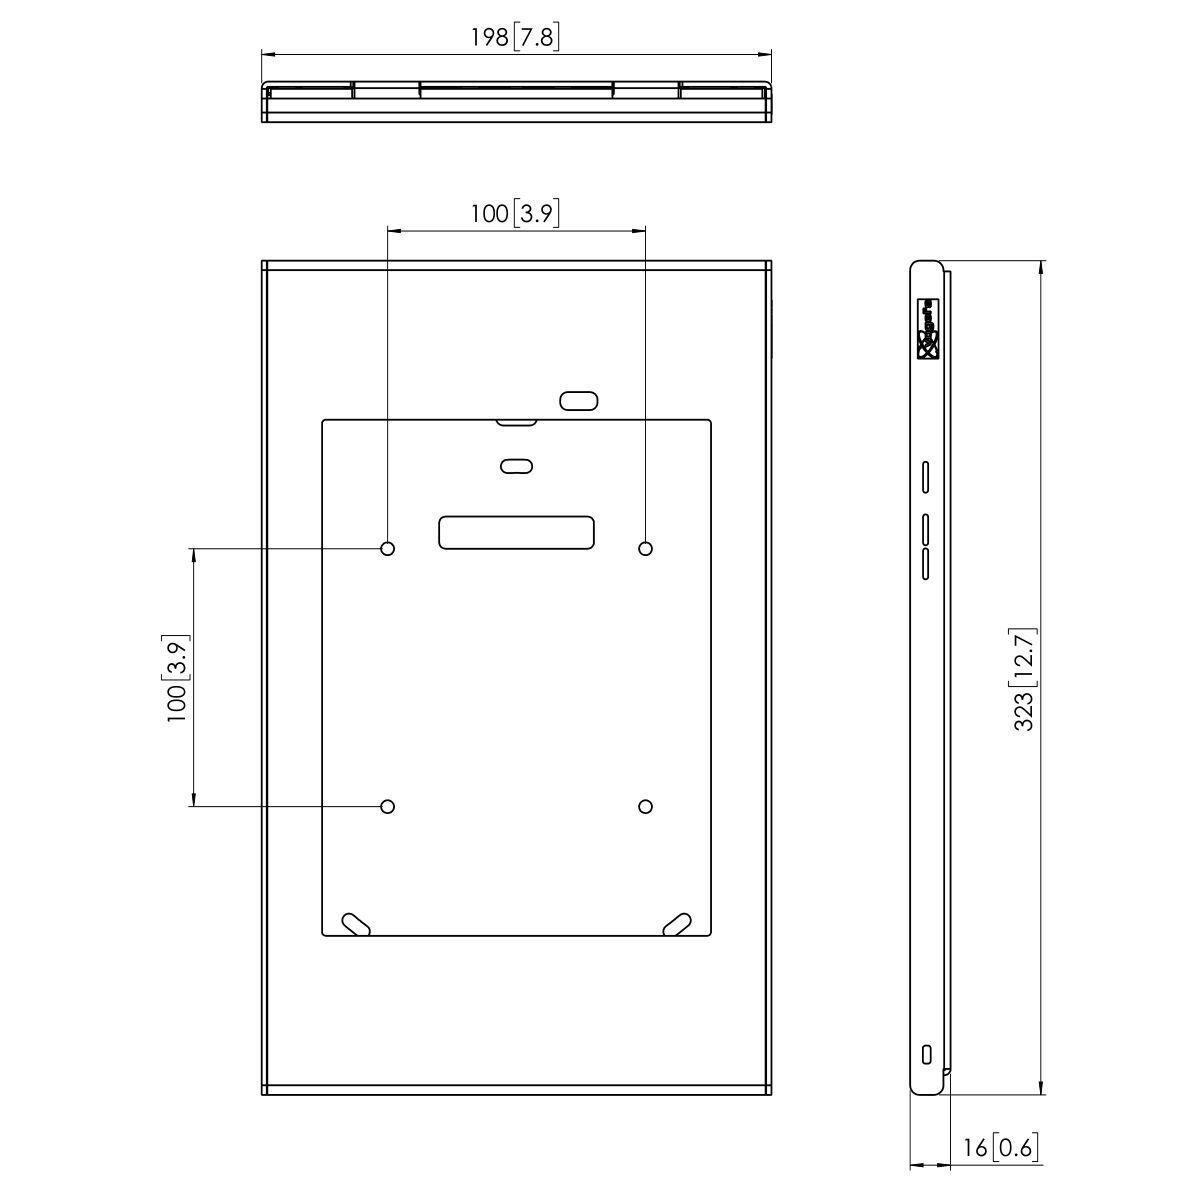 Vogel's PTS 1221 TabLock for Samsung Galaxy Tab A 9.7 - Dimensions